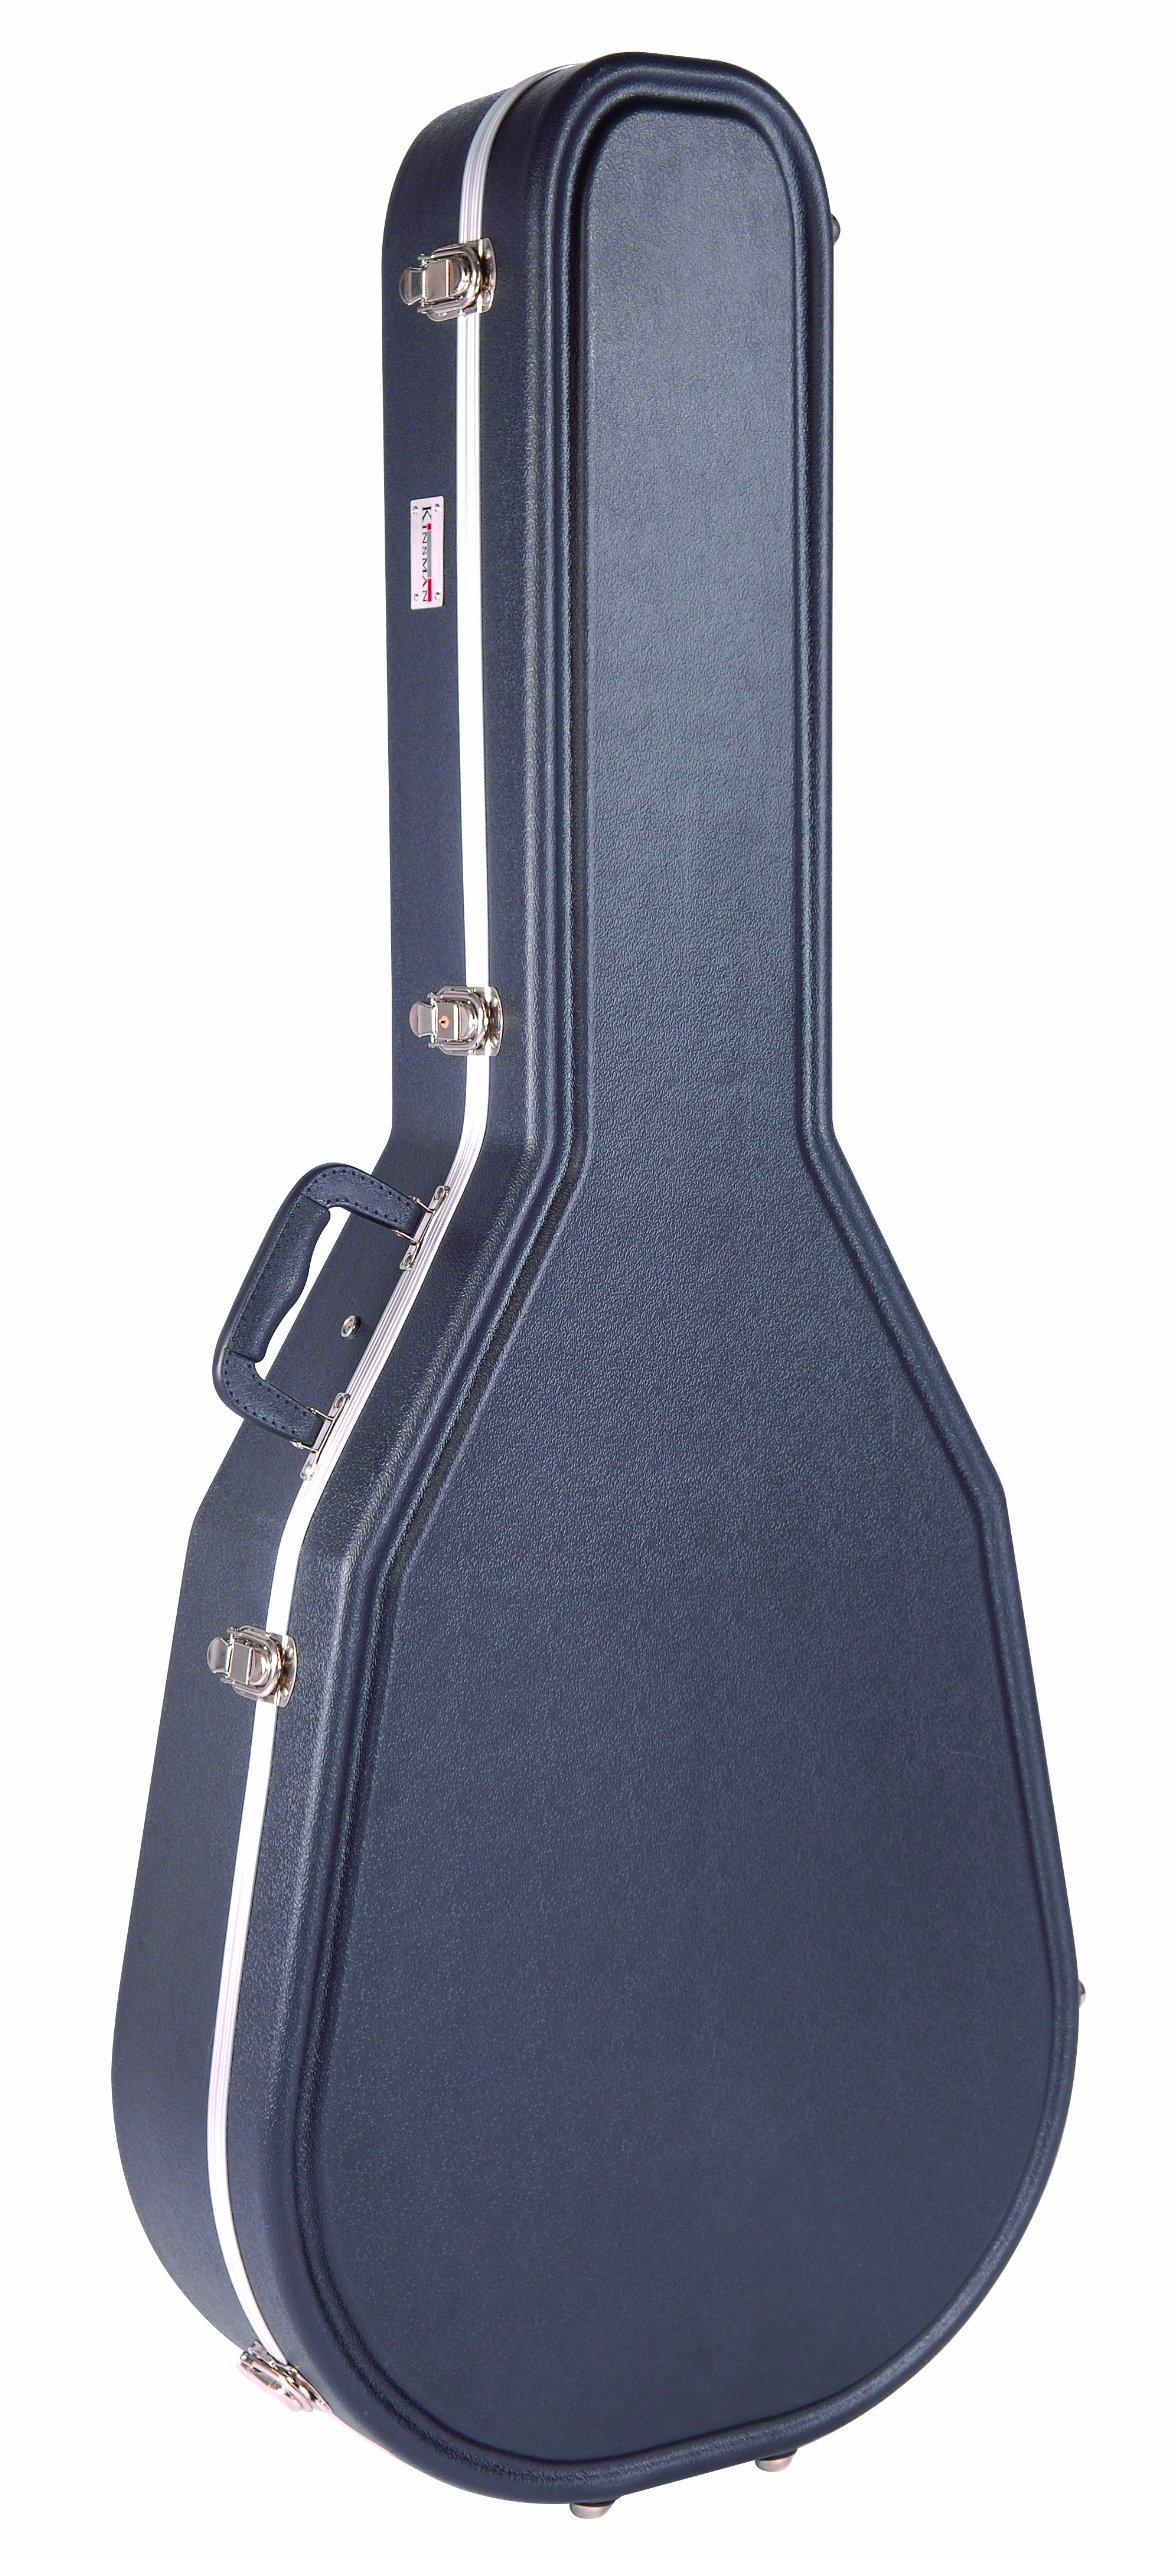 Kinsman KGC8630 - Estuche para guitarra eléctrica de ABS, color negro: Amazon.es: Instrumentos musicales